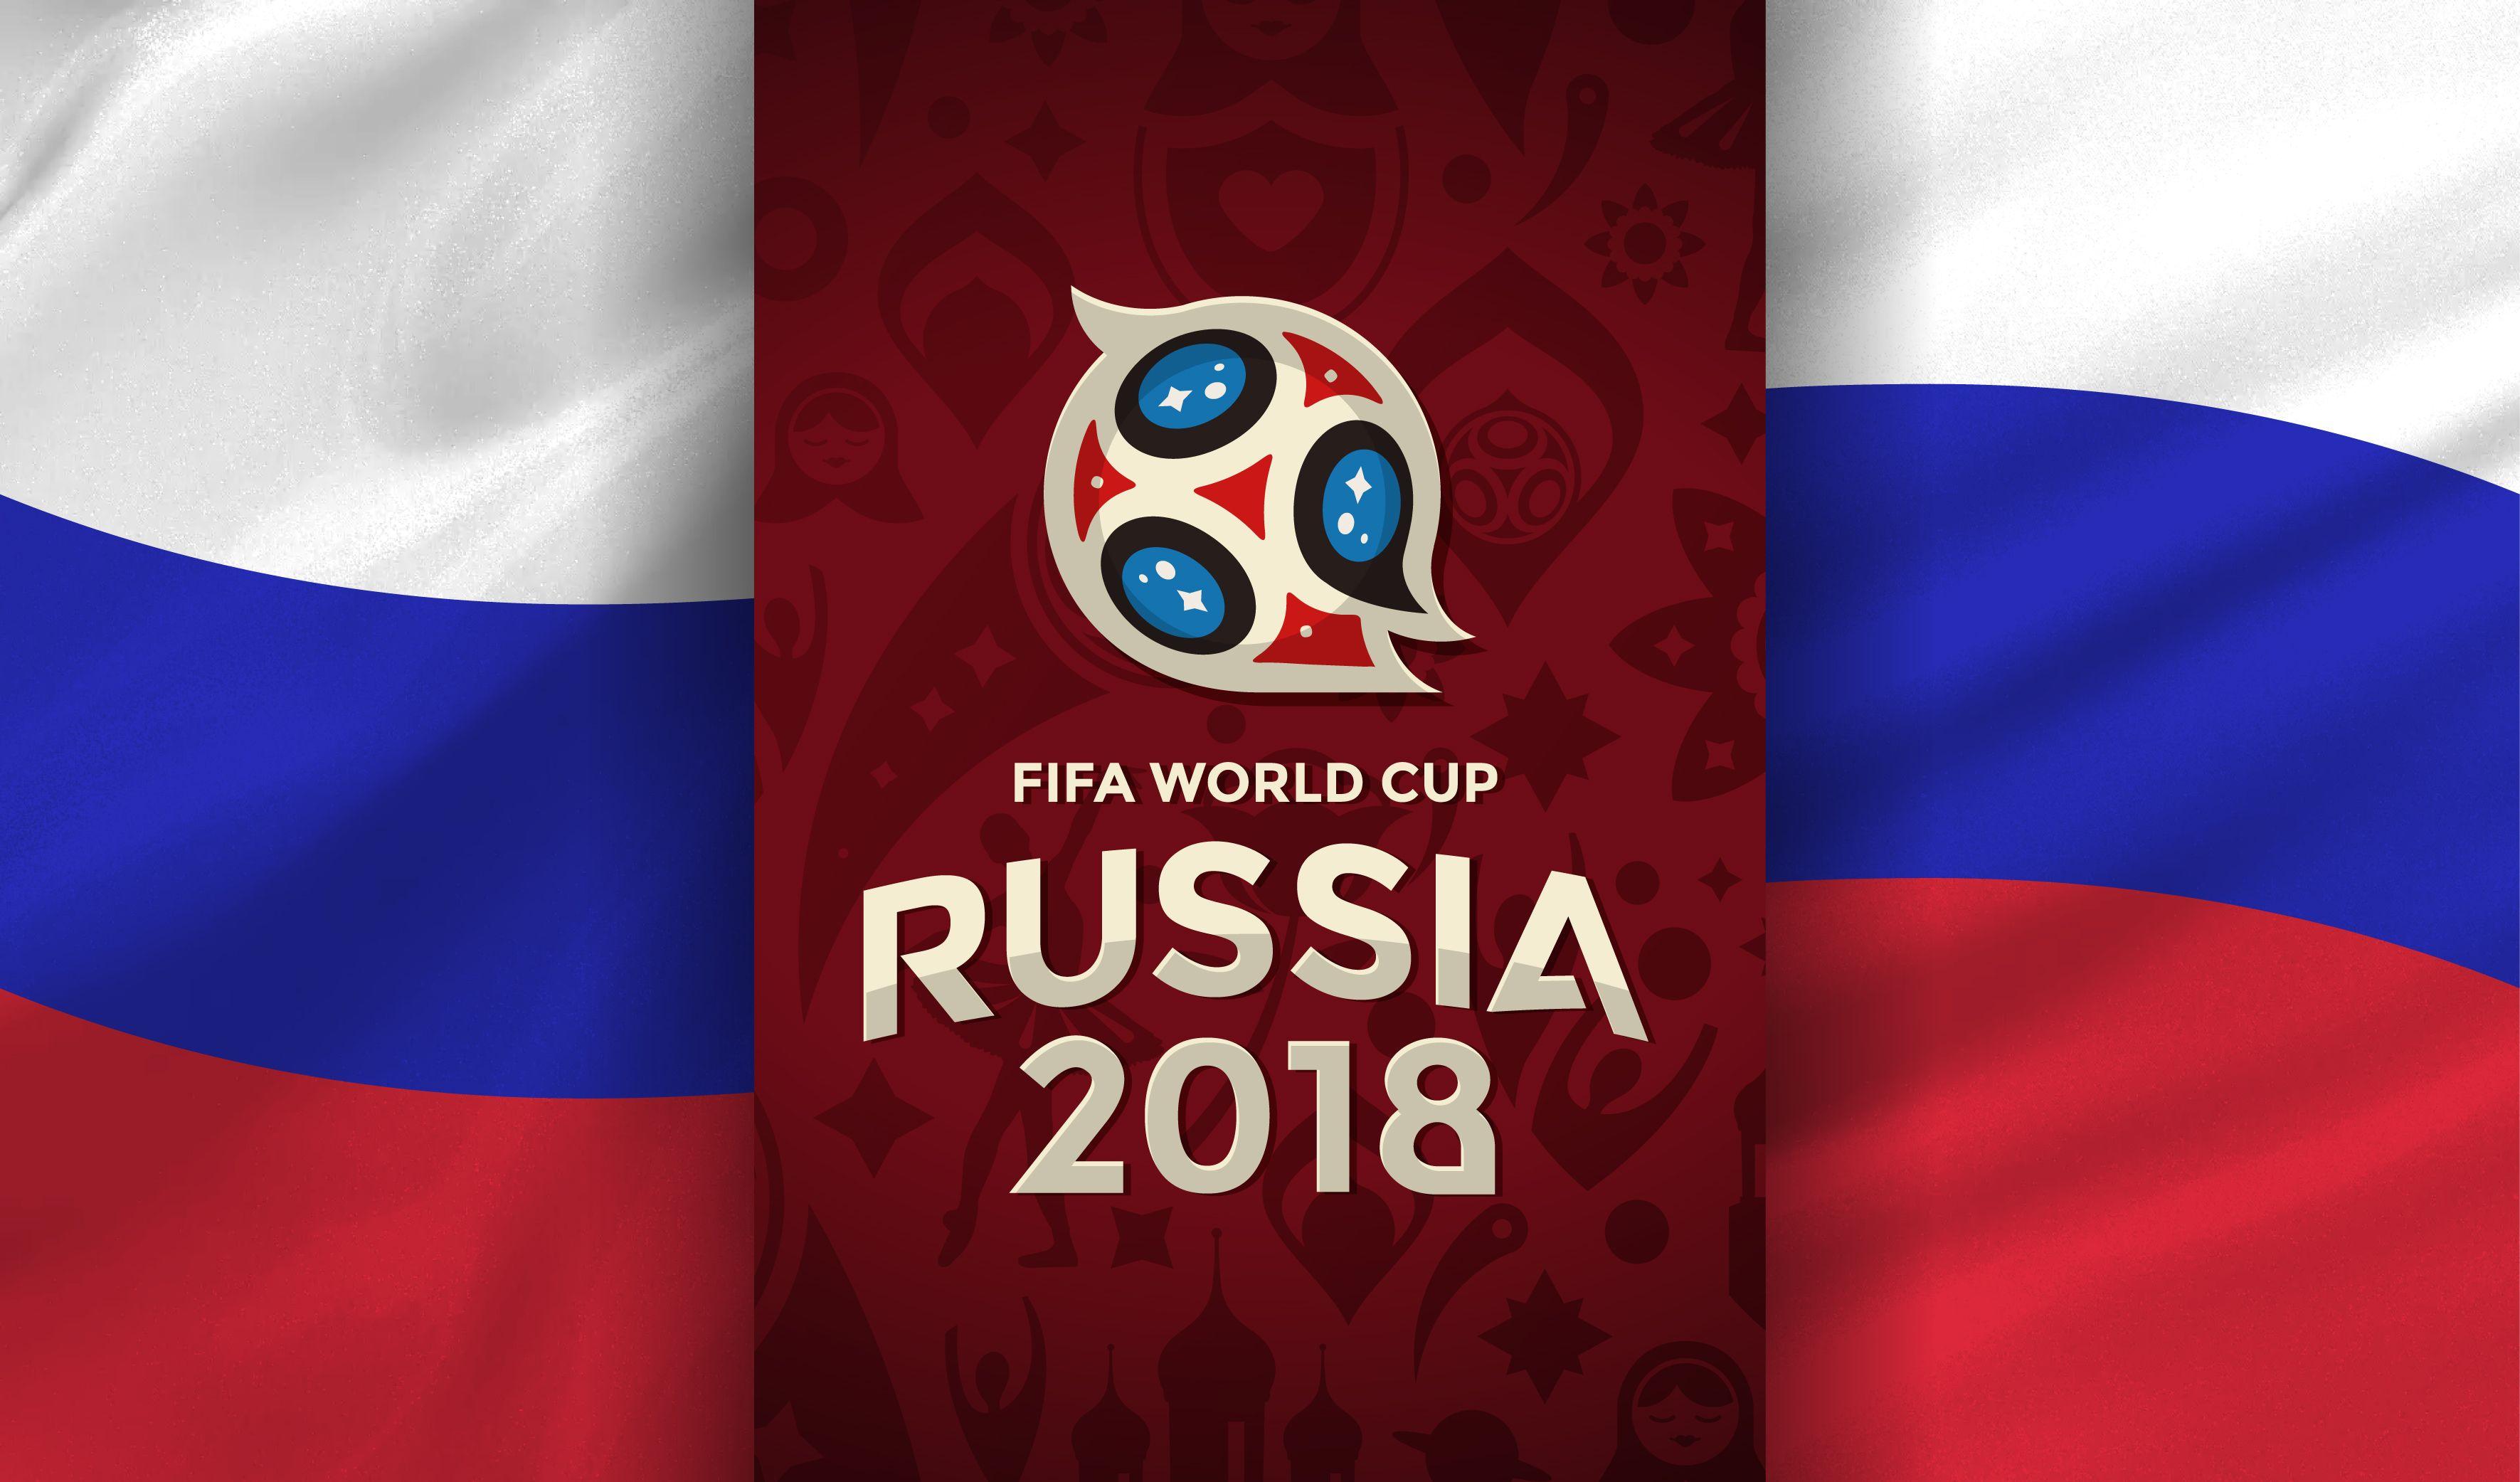 Equipo De Deporte Doodle Fondo Transparente: Copa Mundial, Copa, Mundo